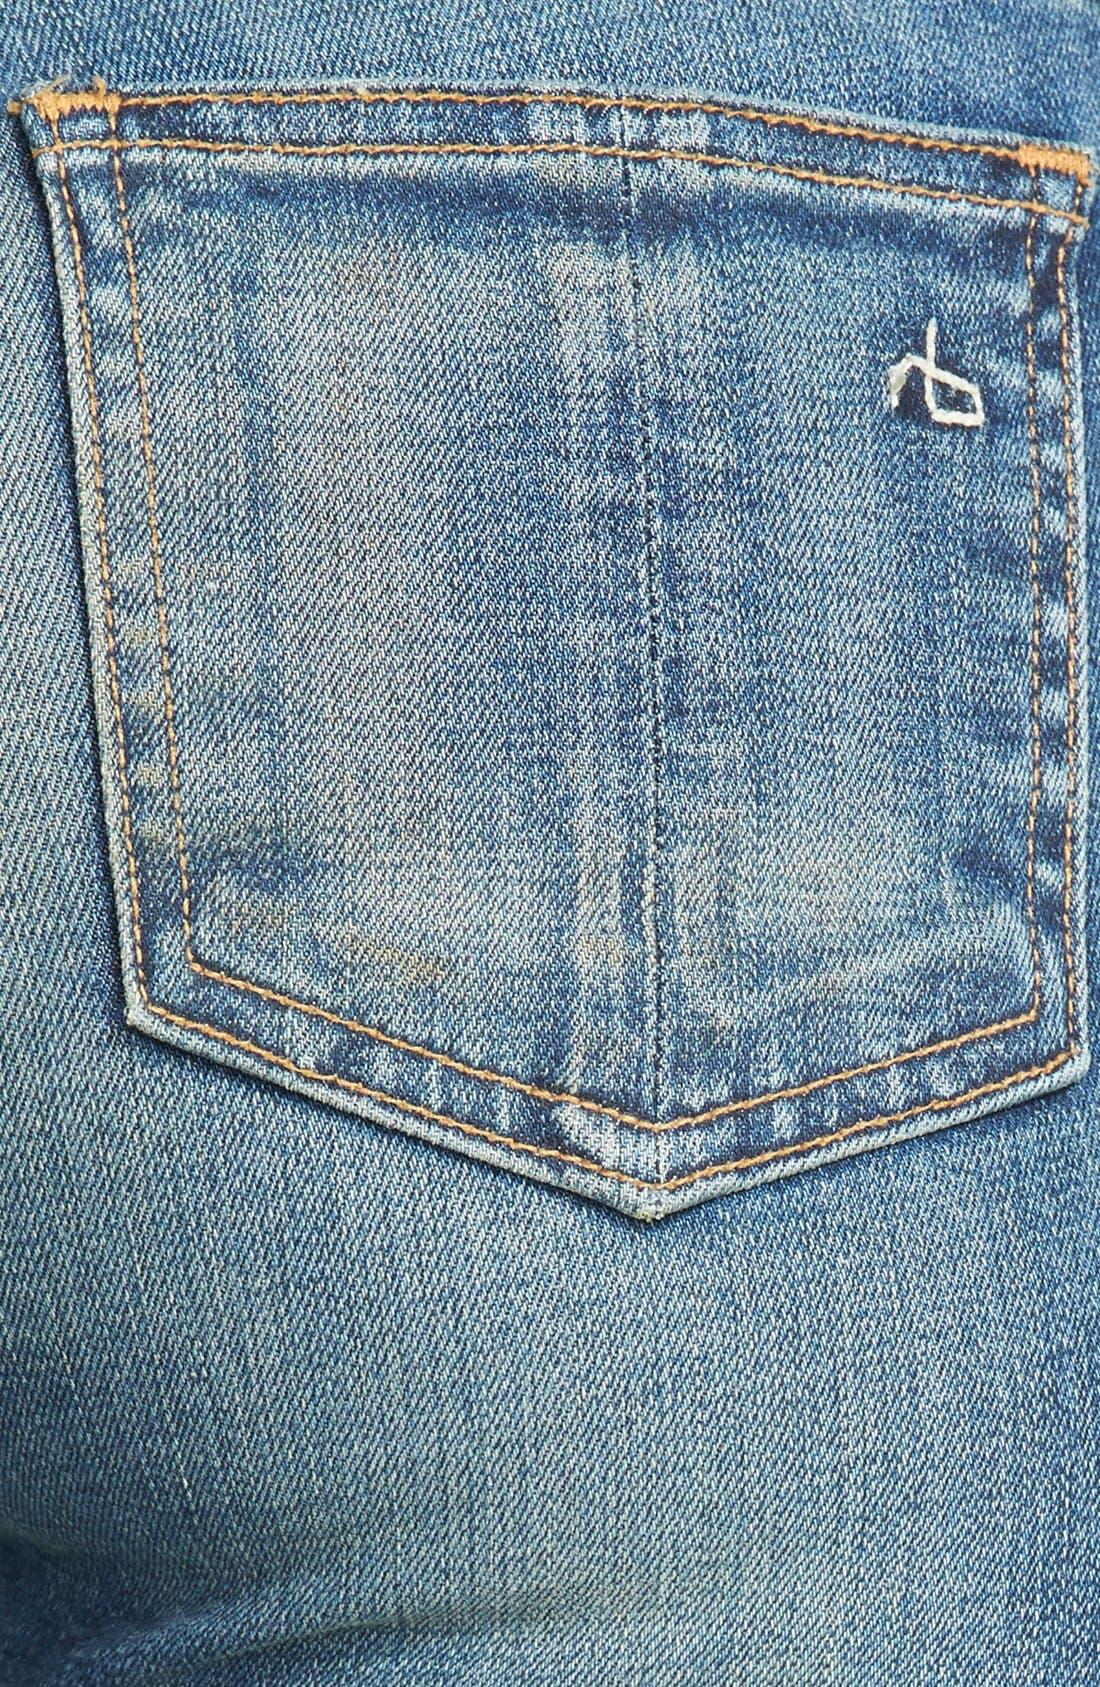 Alternate Image 3  - rag & bone/JEAN Skinny Stretch Jeans (Brimfield)